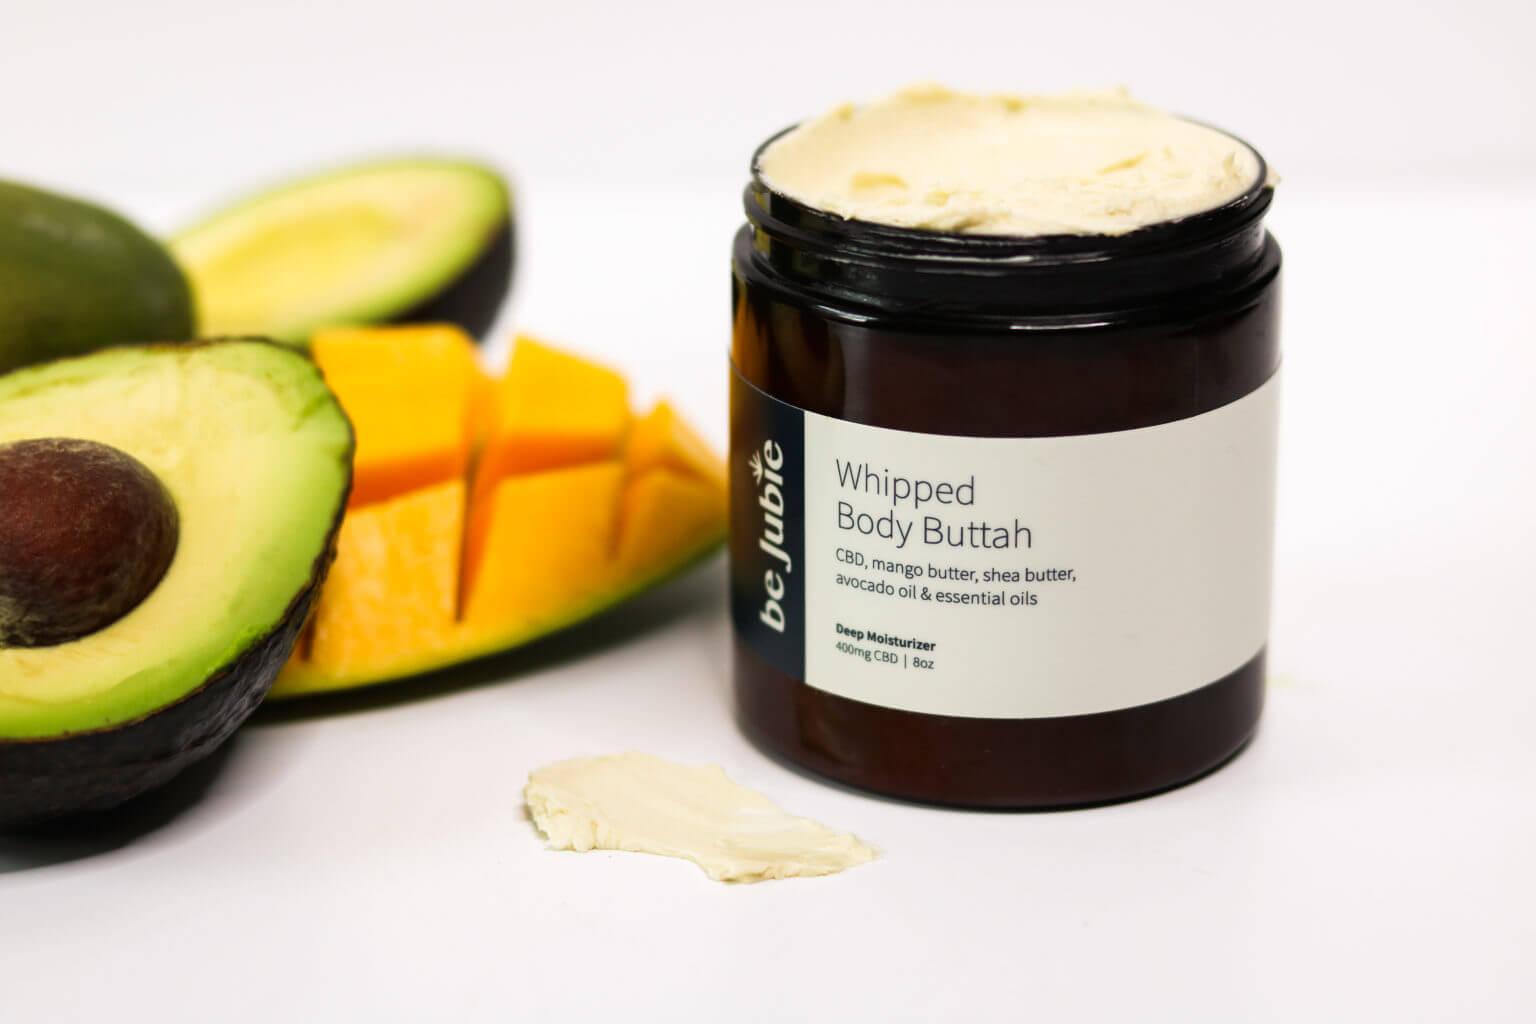 Scented Cbd Body Butter - Avocado And Mango